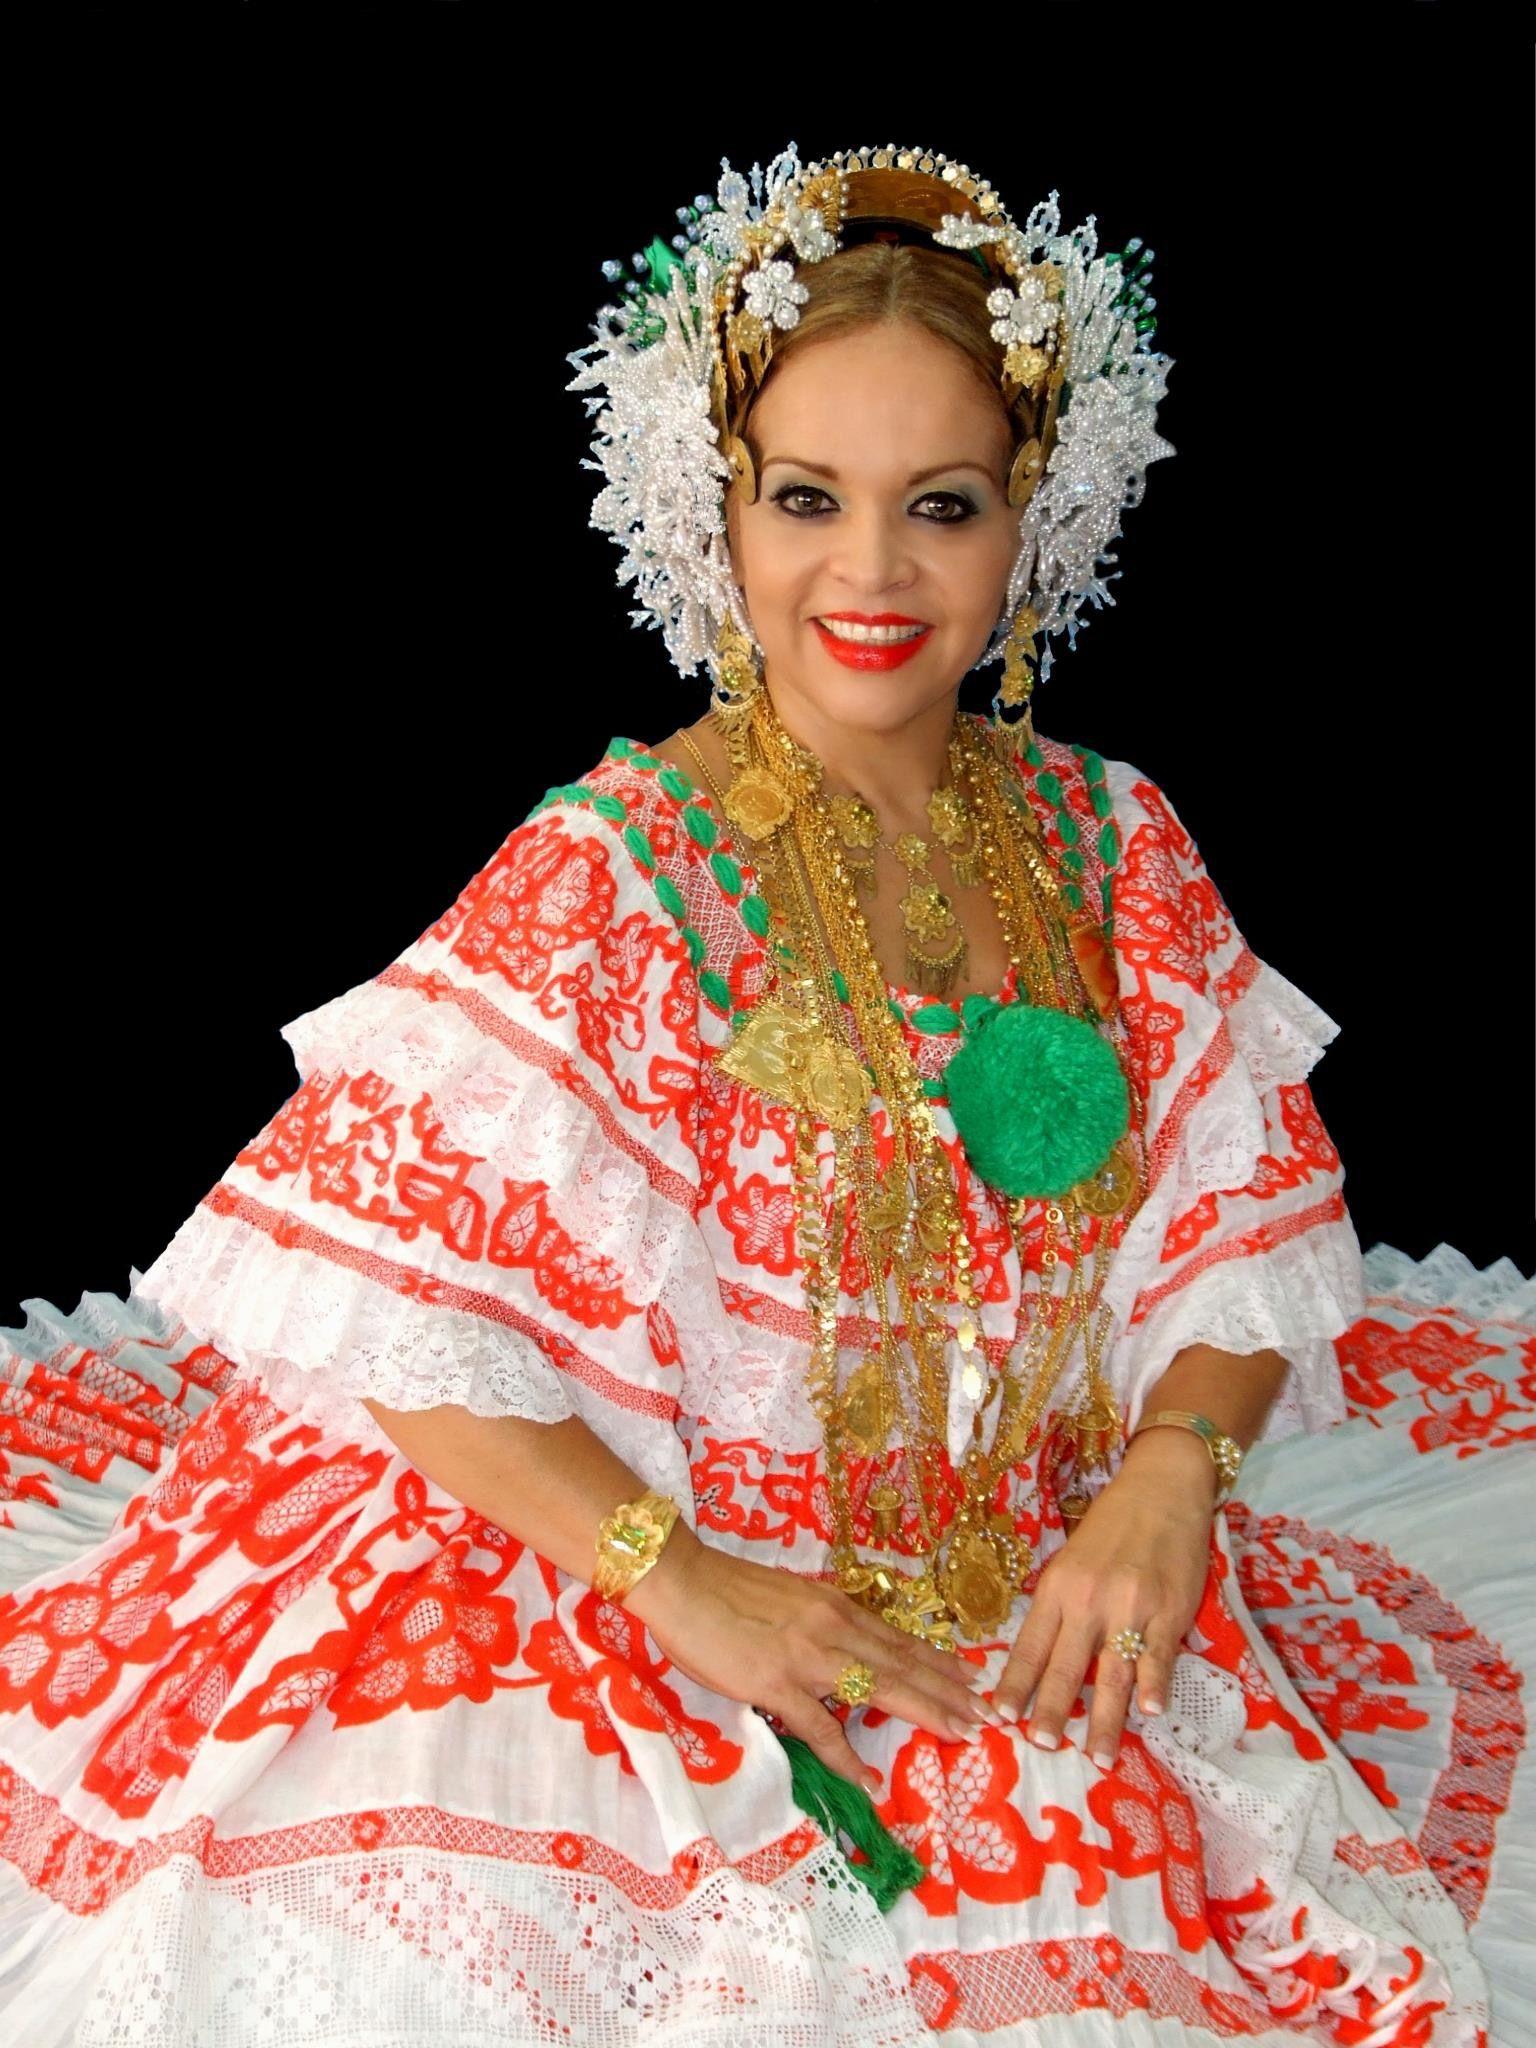 Bella dama, bella pollera! Panamá | Panama Culture ...